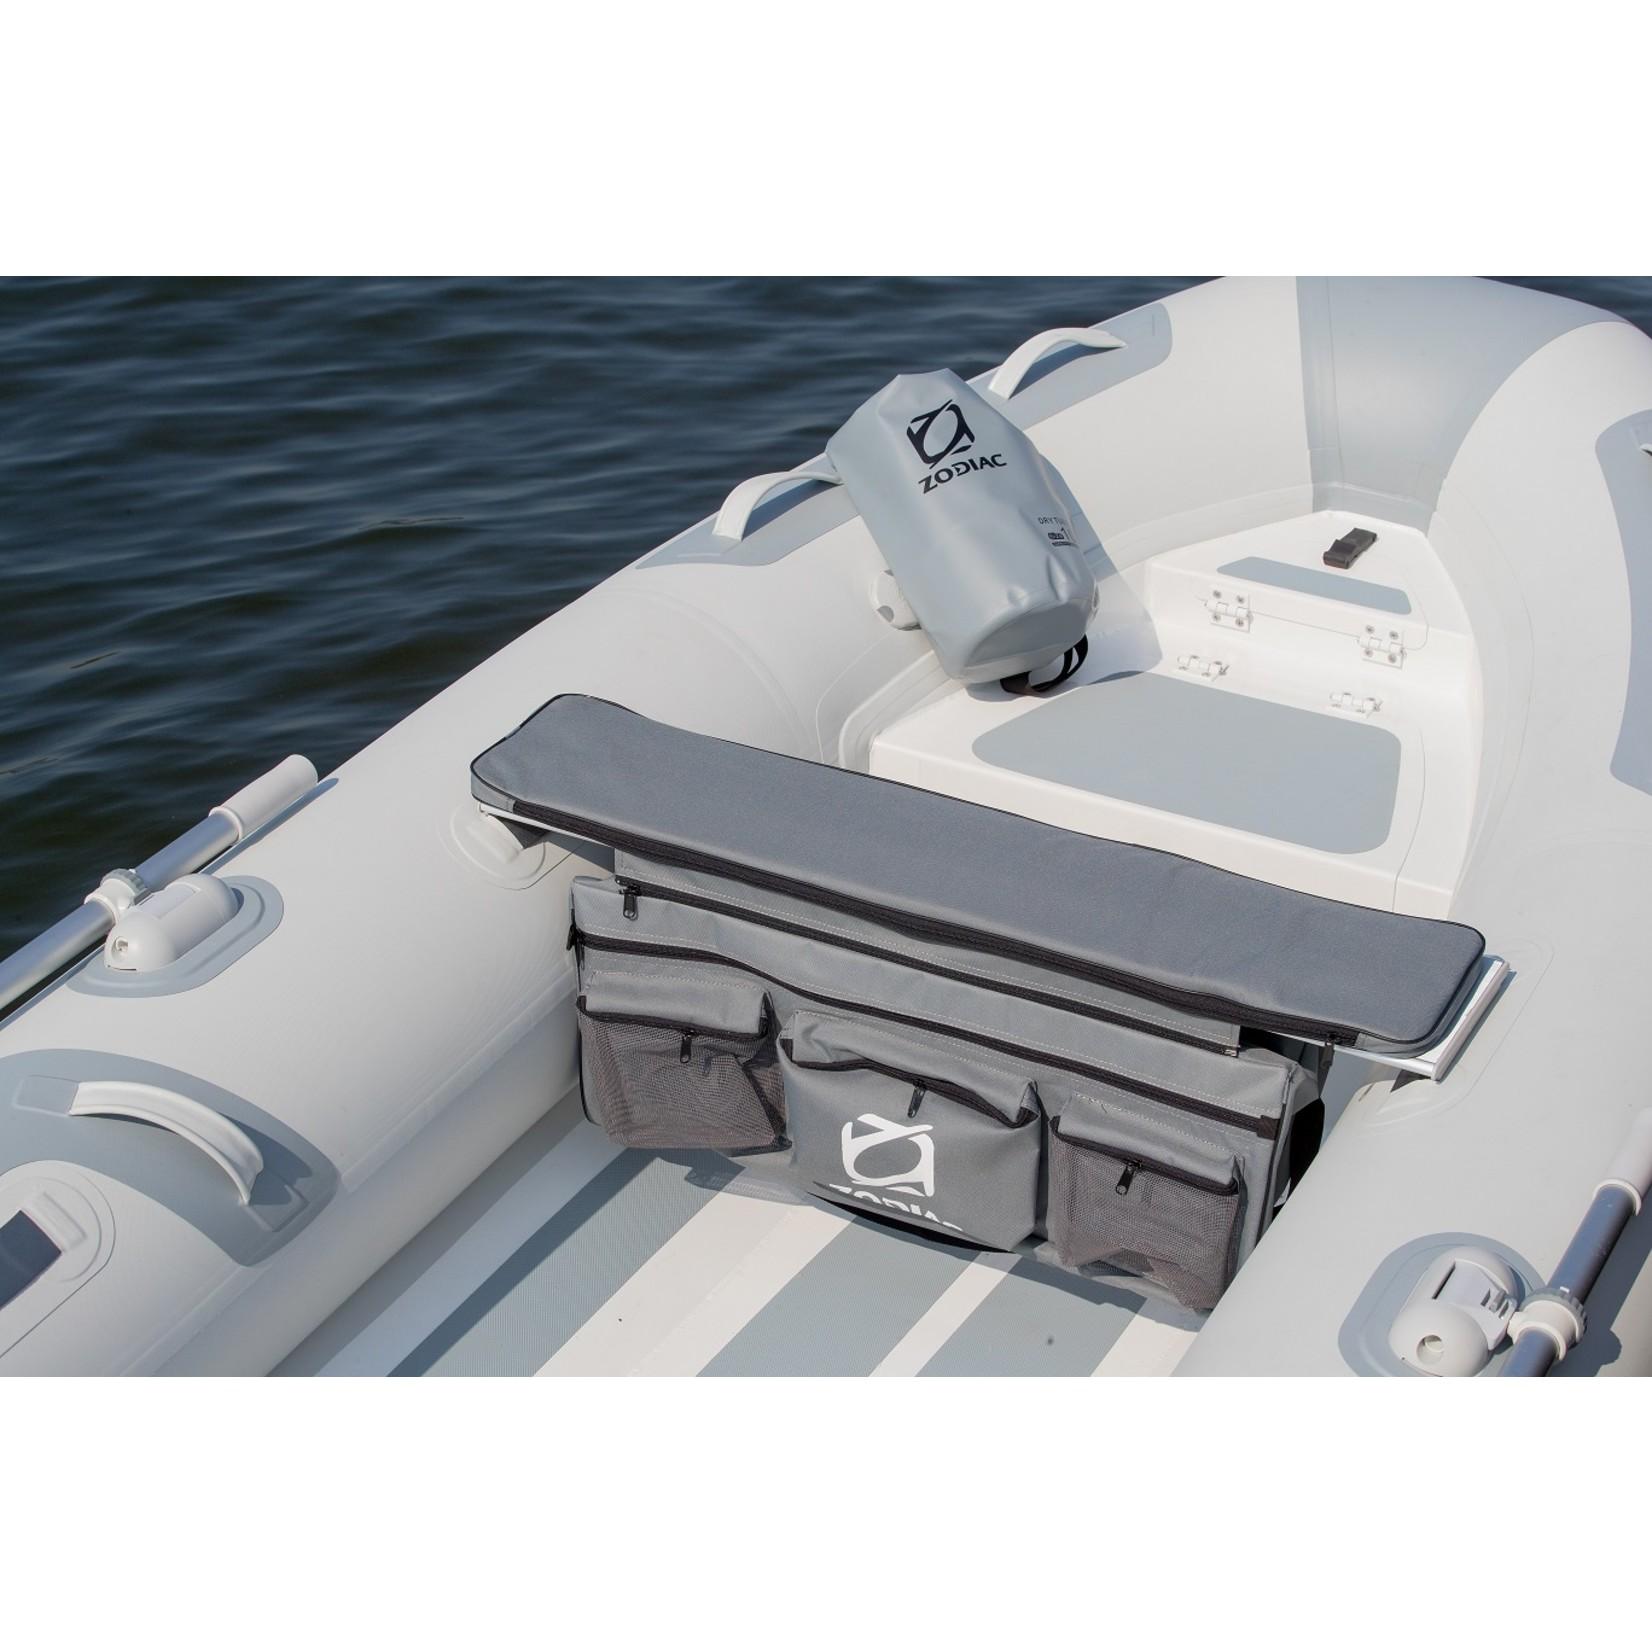 Zodiac Cadet 330 DL ALU RIB - Deck & Locker (3.33 m.)